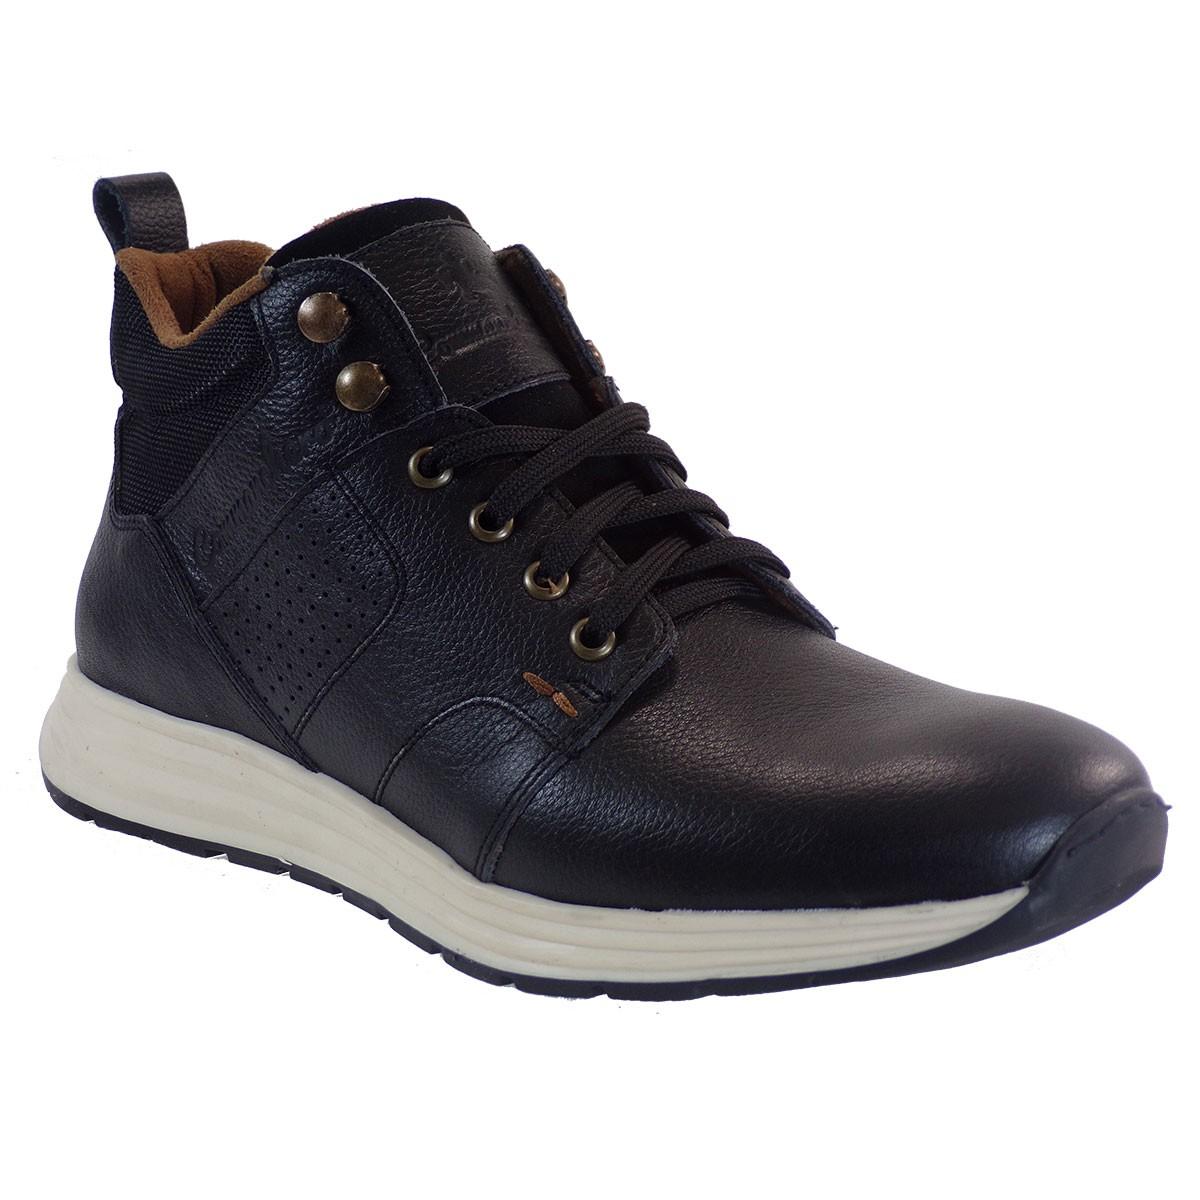 Commanchero Ανδρικά Μποτάκια Αστραγάλου Sneakers 72111-721 Μαύρο Δέρμα